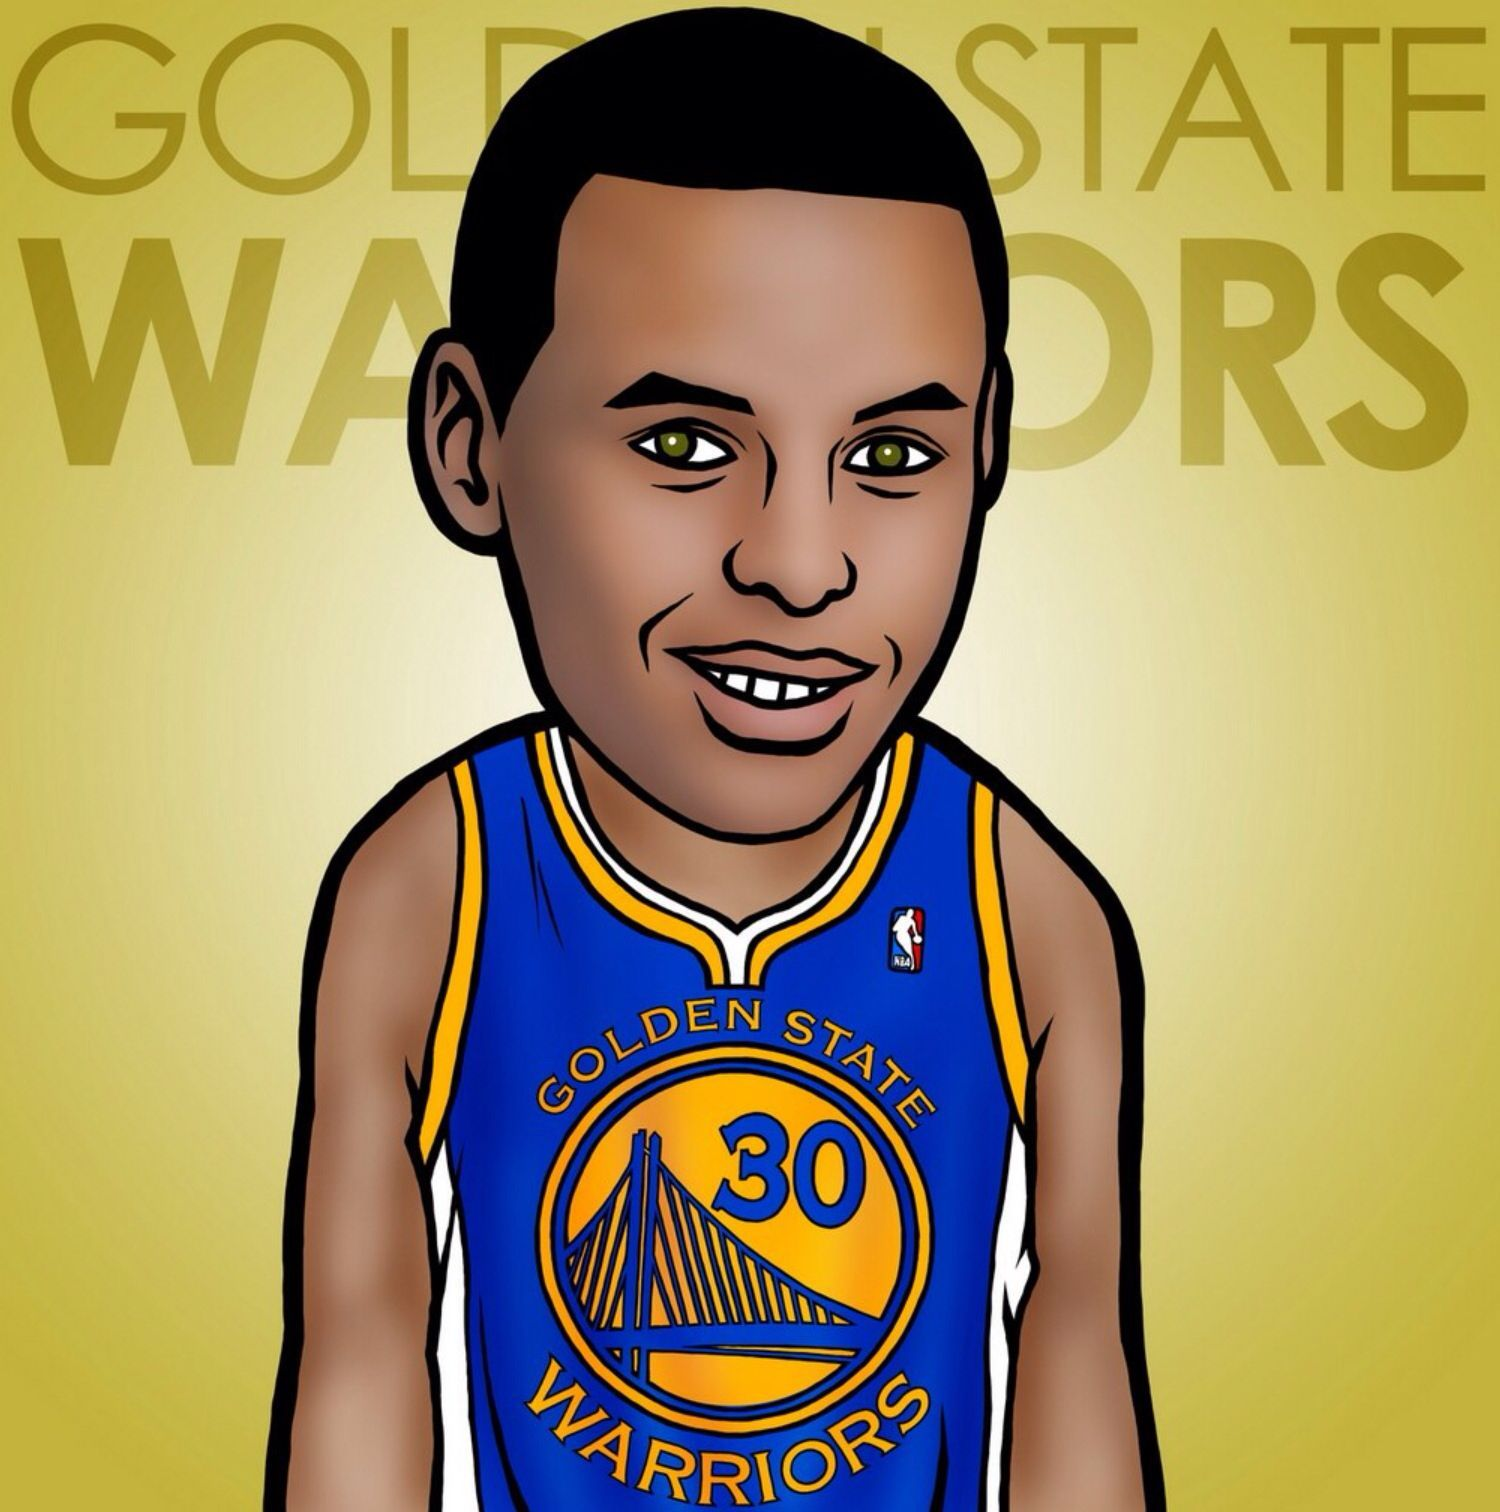 Stephen Curry | NBA cartoon image | Cartoon wallpaper ...